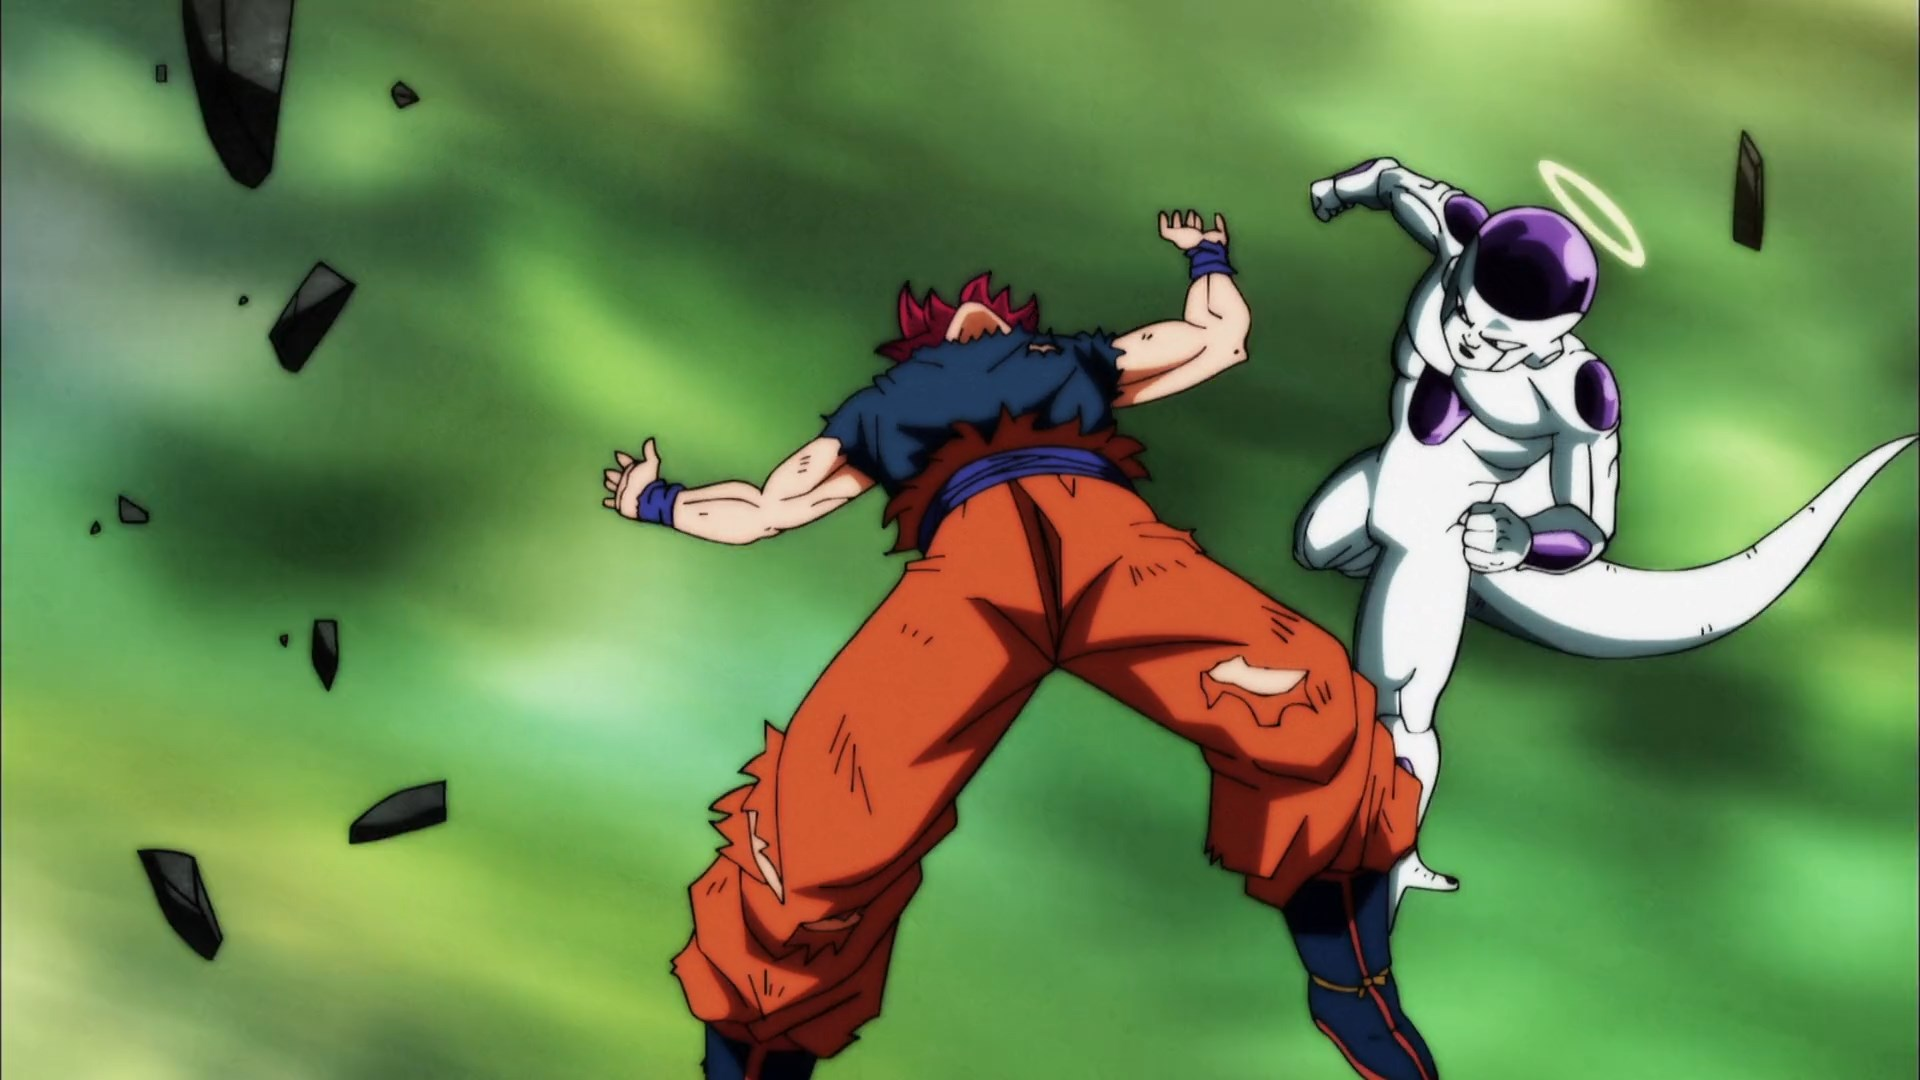 [HorribleSubs] Dragon Ball Super - 121 [1080p].mkv_snapshot_11.40